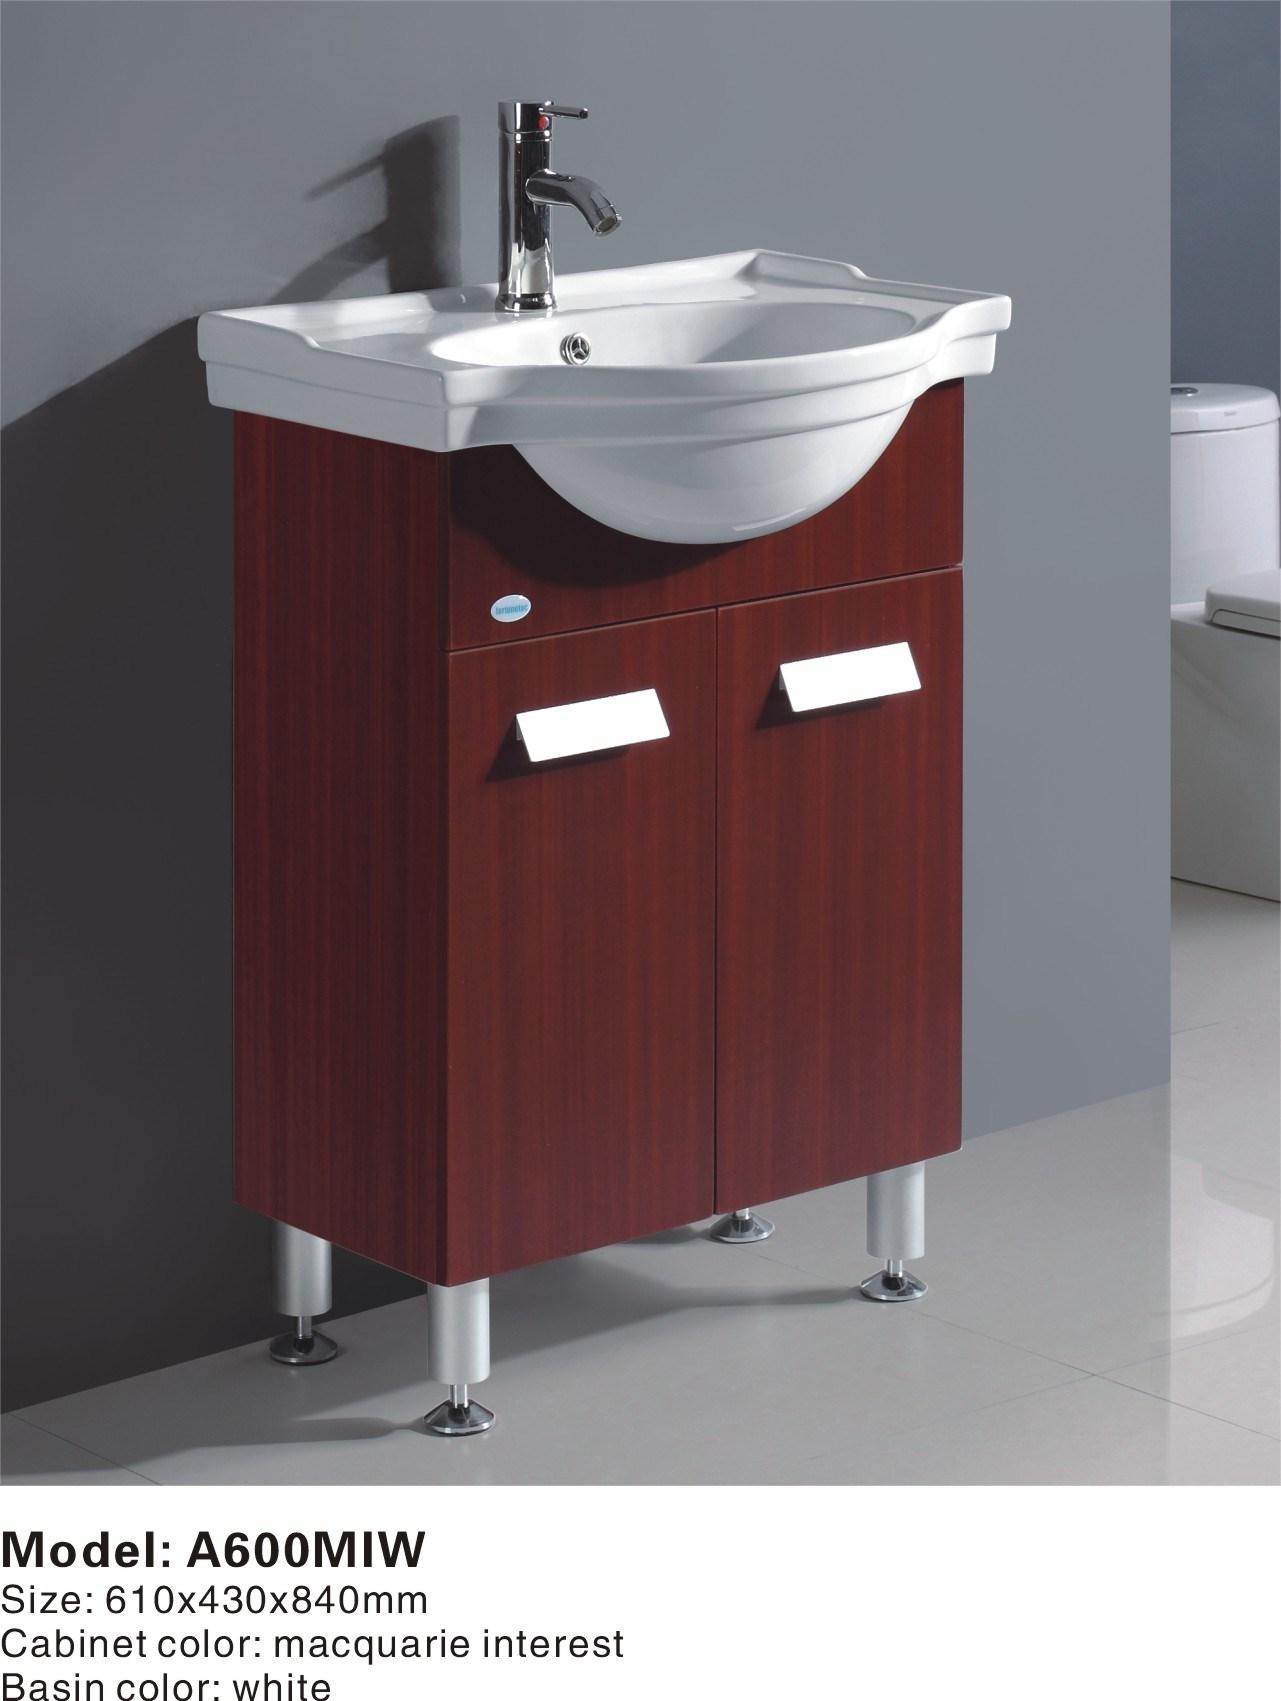 MDF Bathroom Vanity Bathroom Furniture A600MIW China Bathroom Cabinet B